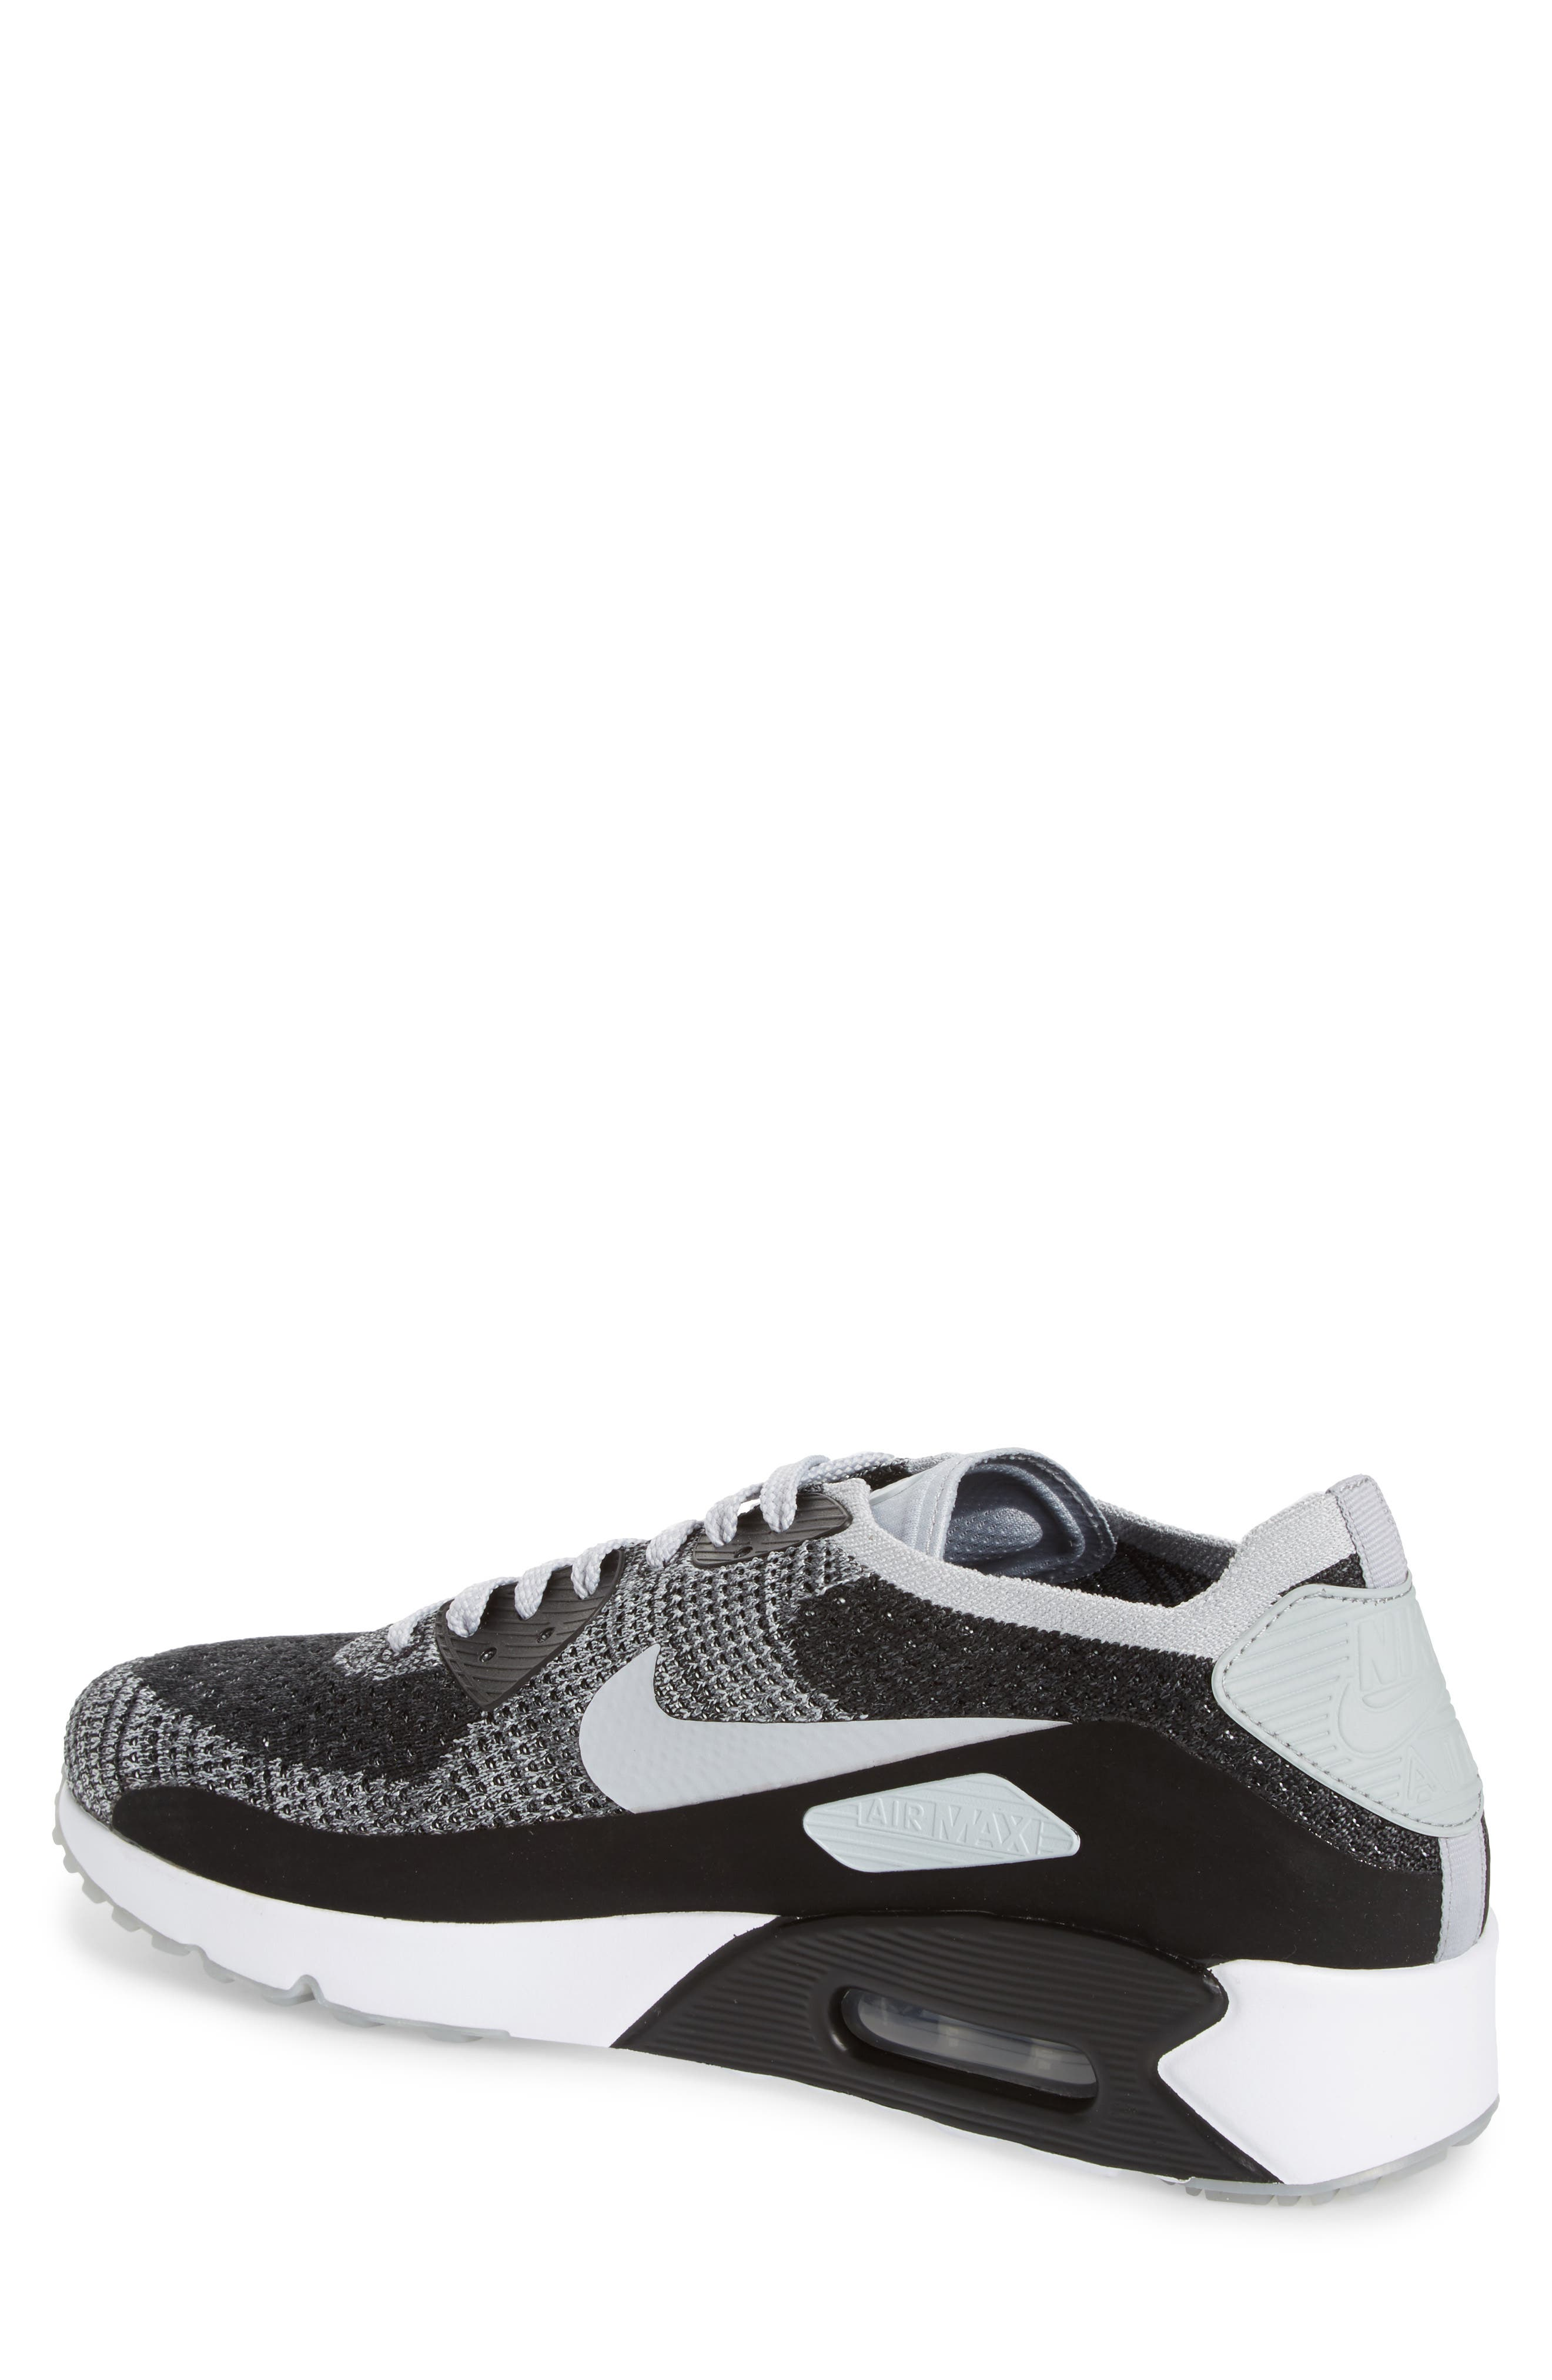 Air Max 90 Ultra 2.0 Flyknit Sneaker,                             Alternate thumbnail 2, color,                             005